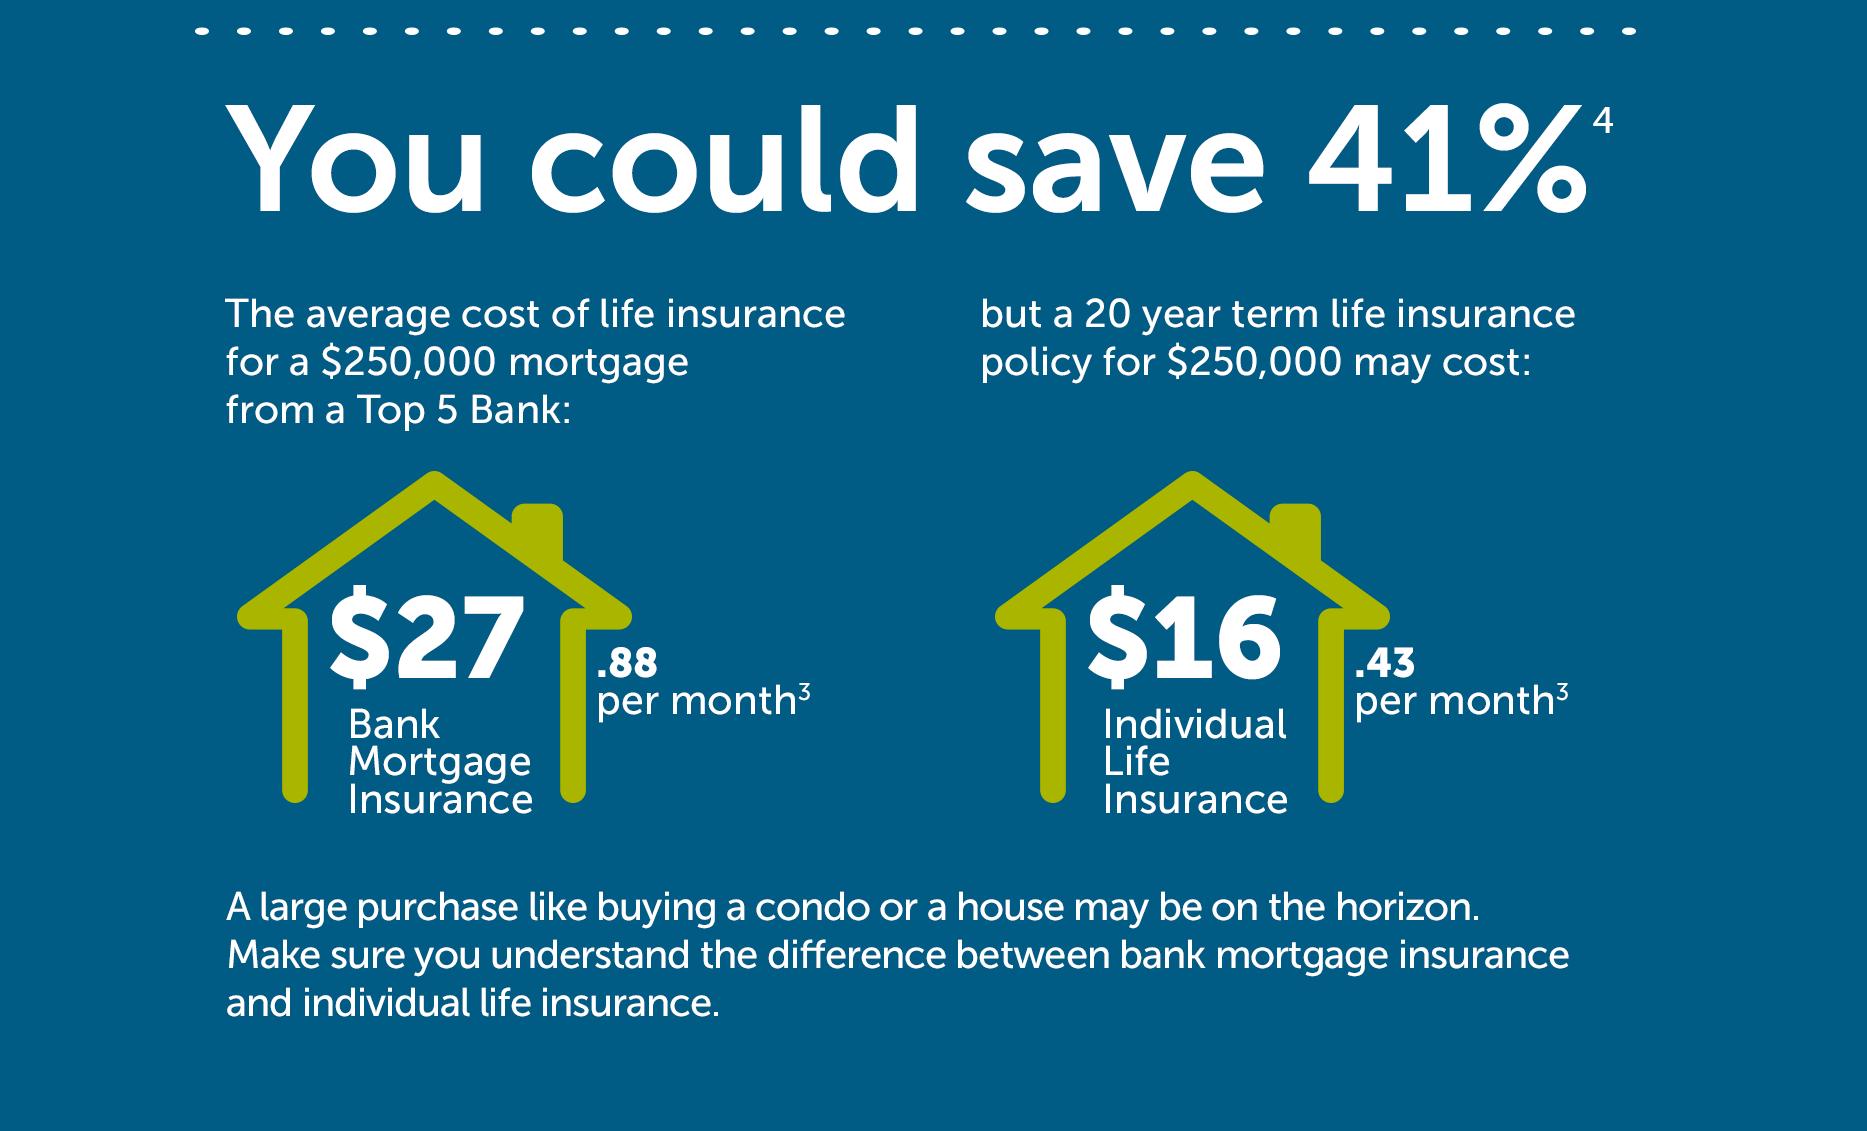 Millennial Life Insurance Statistic 2